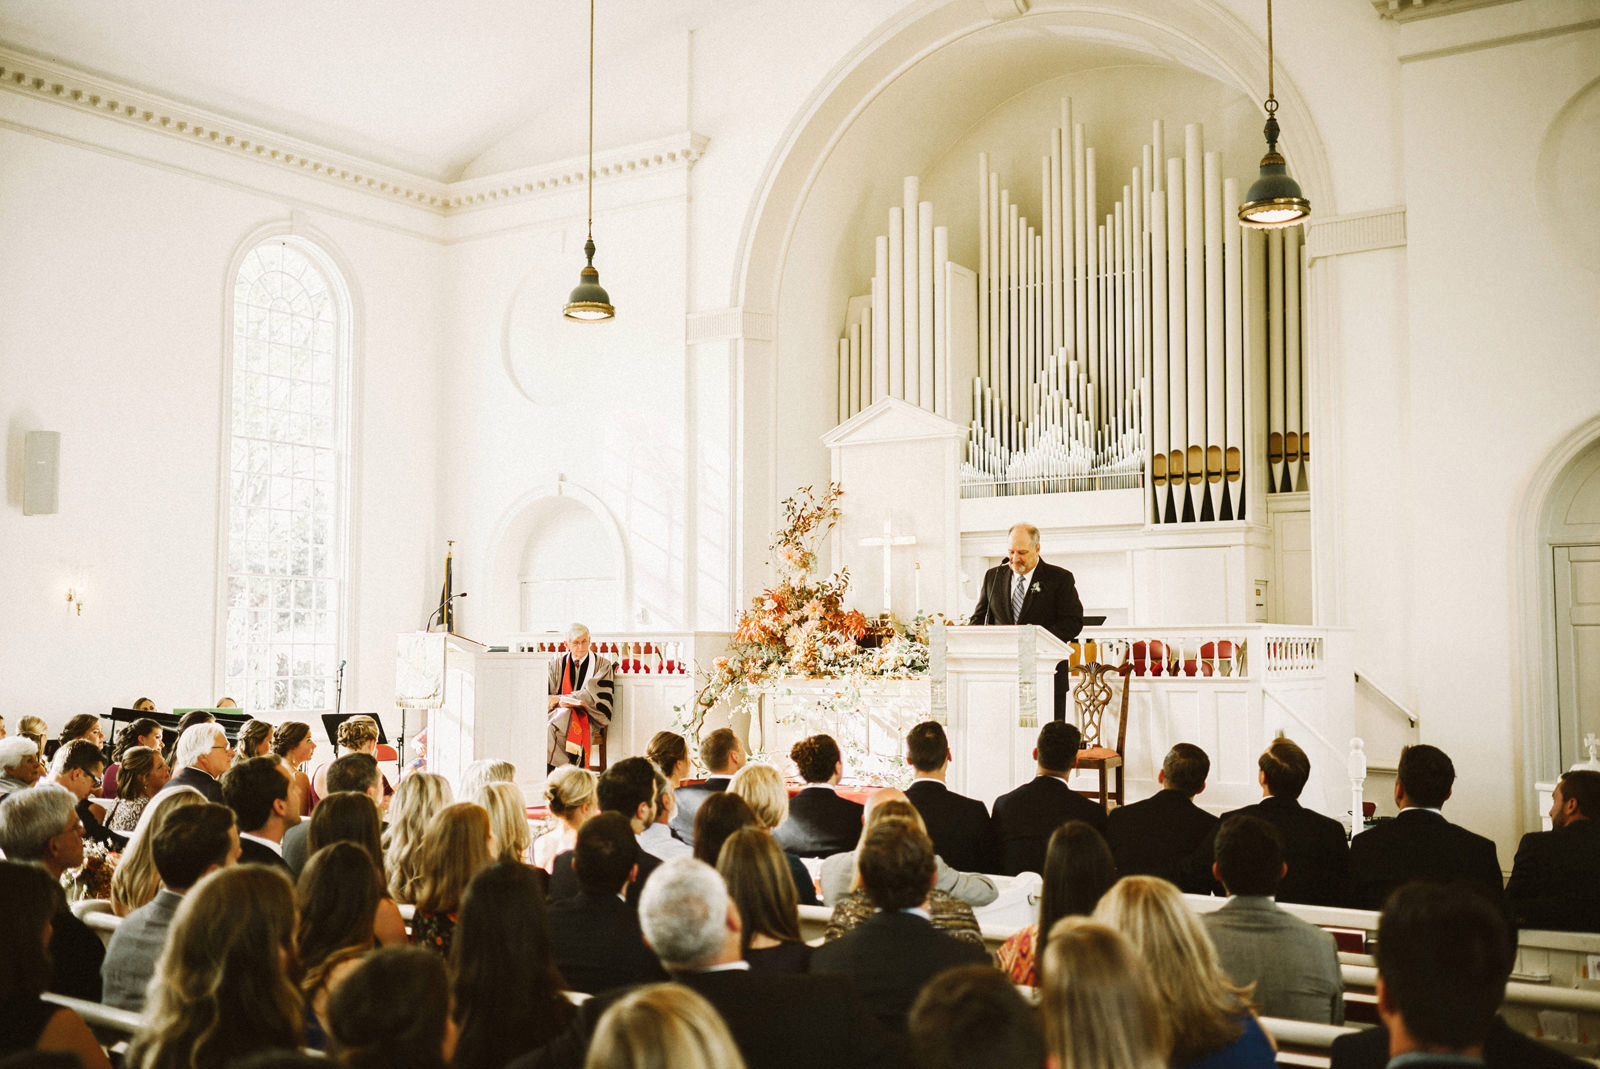 bridgeport-wedding-064 BRIDGEPORT, CONNECTICUT BACKYARD WEDDING